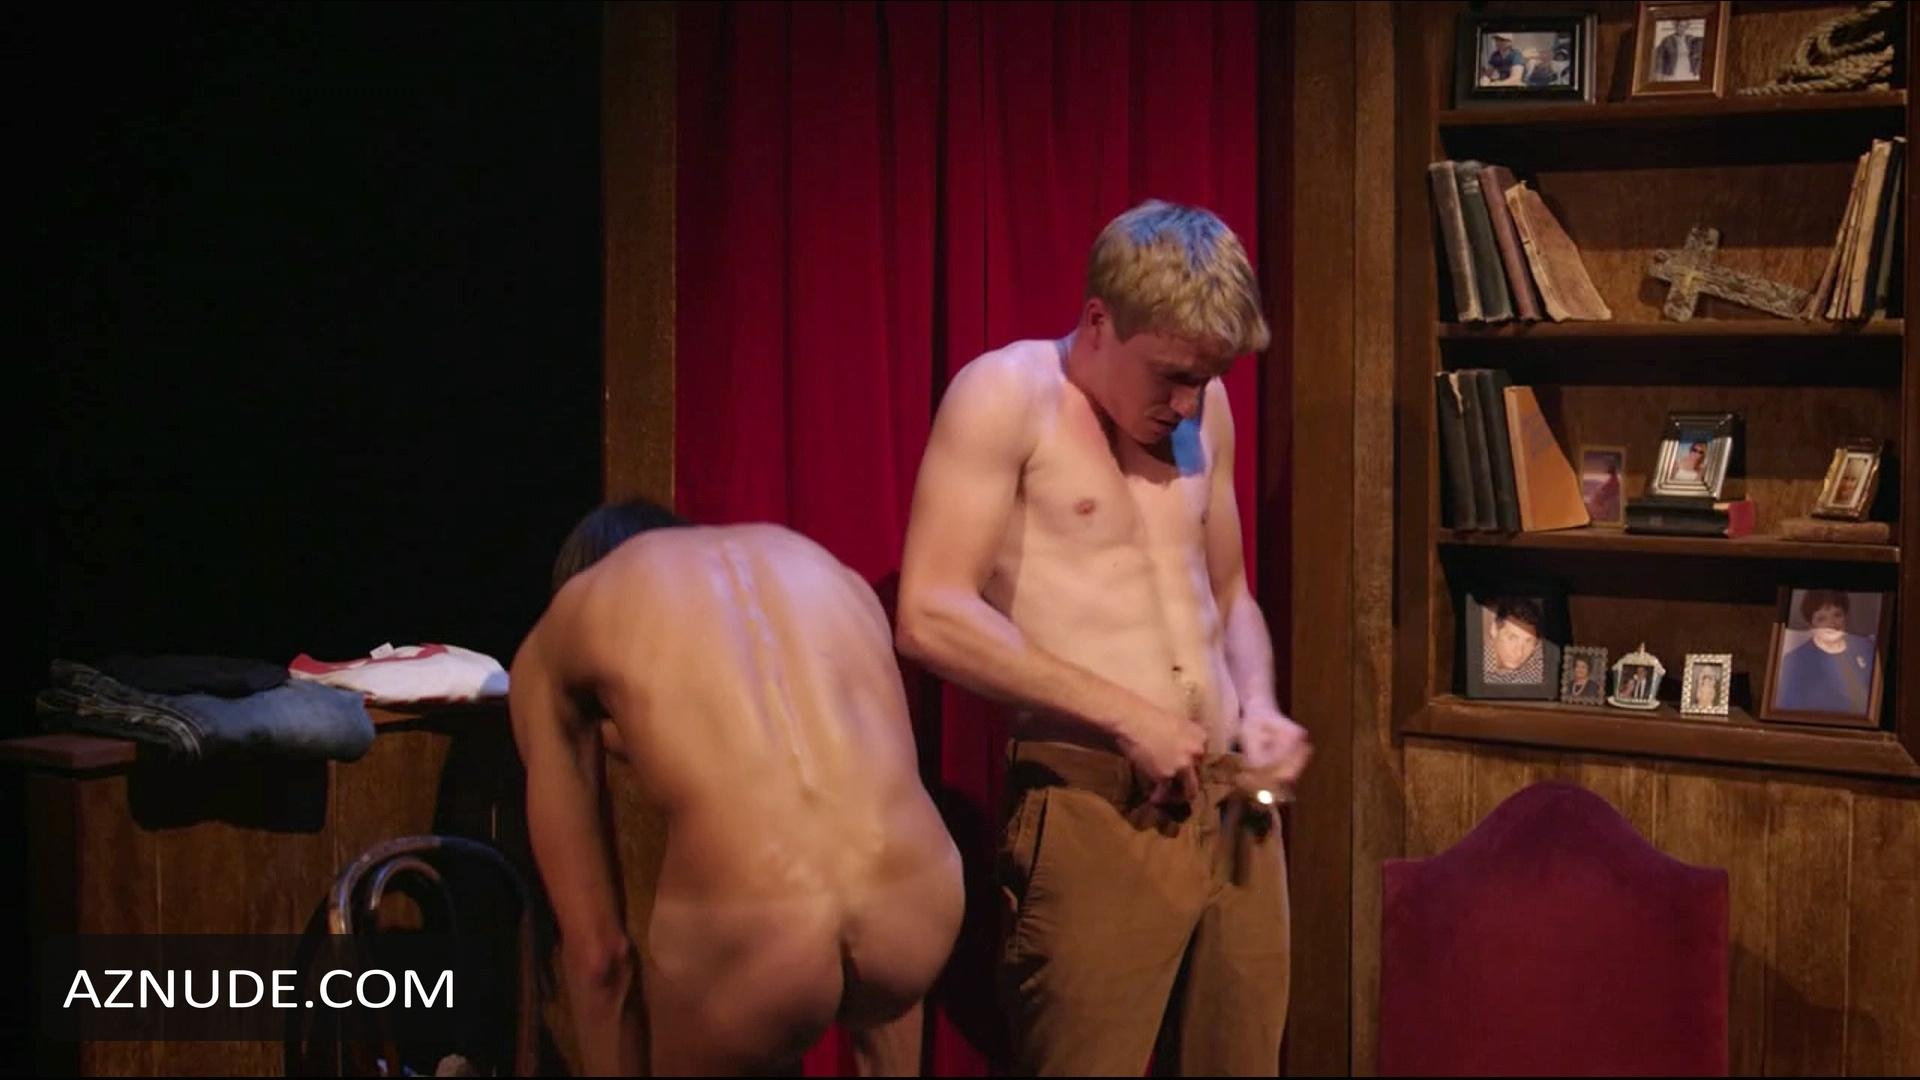 baptist views on sex